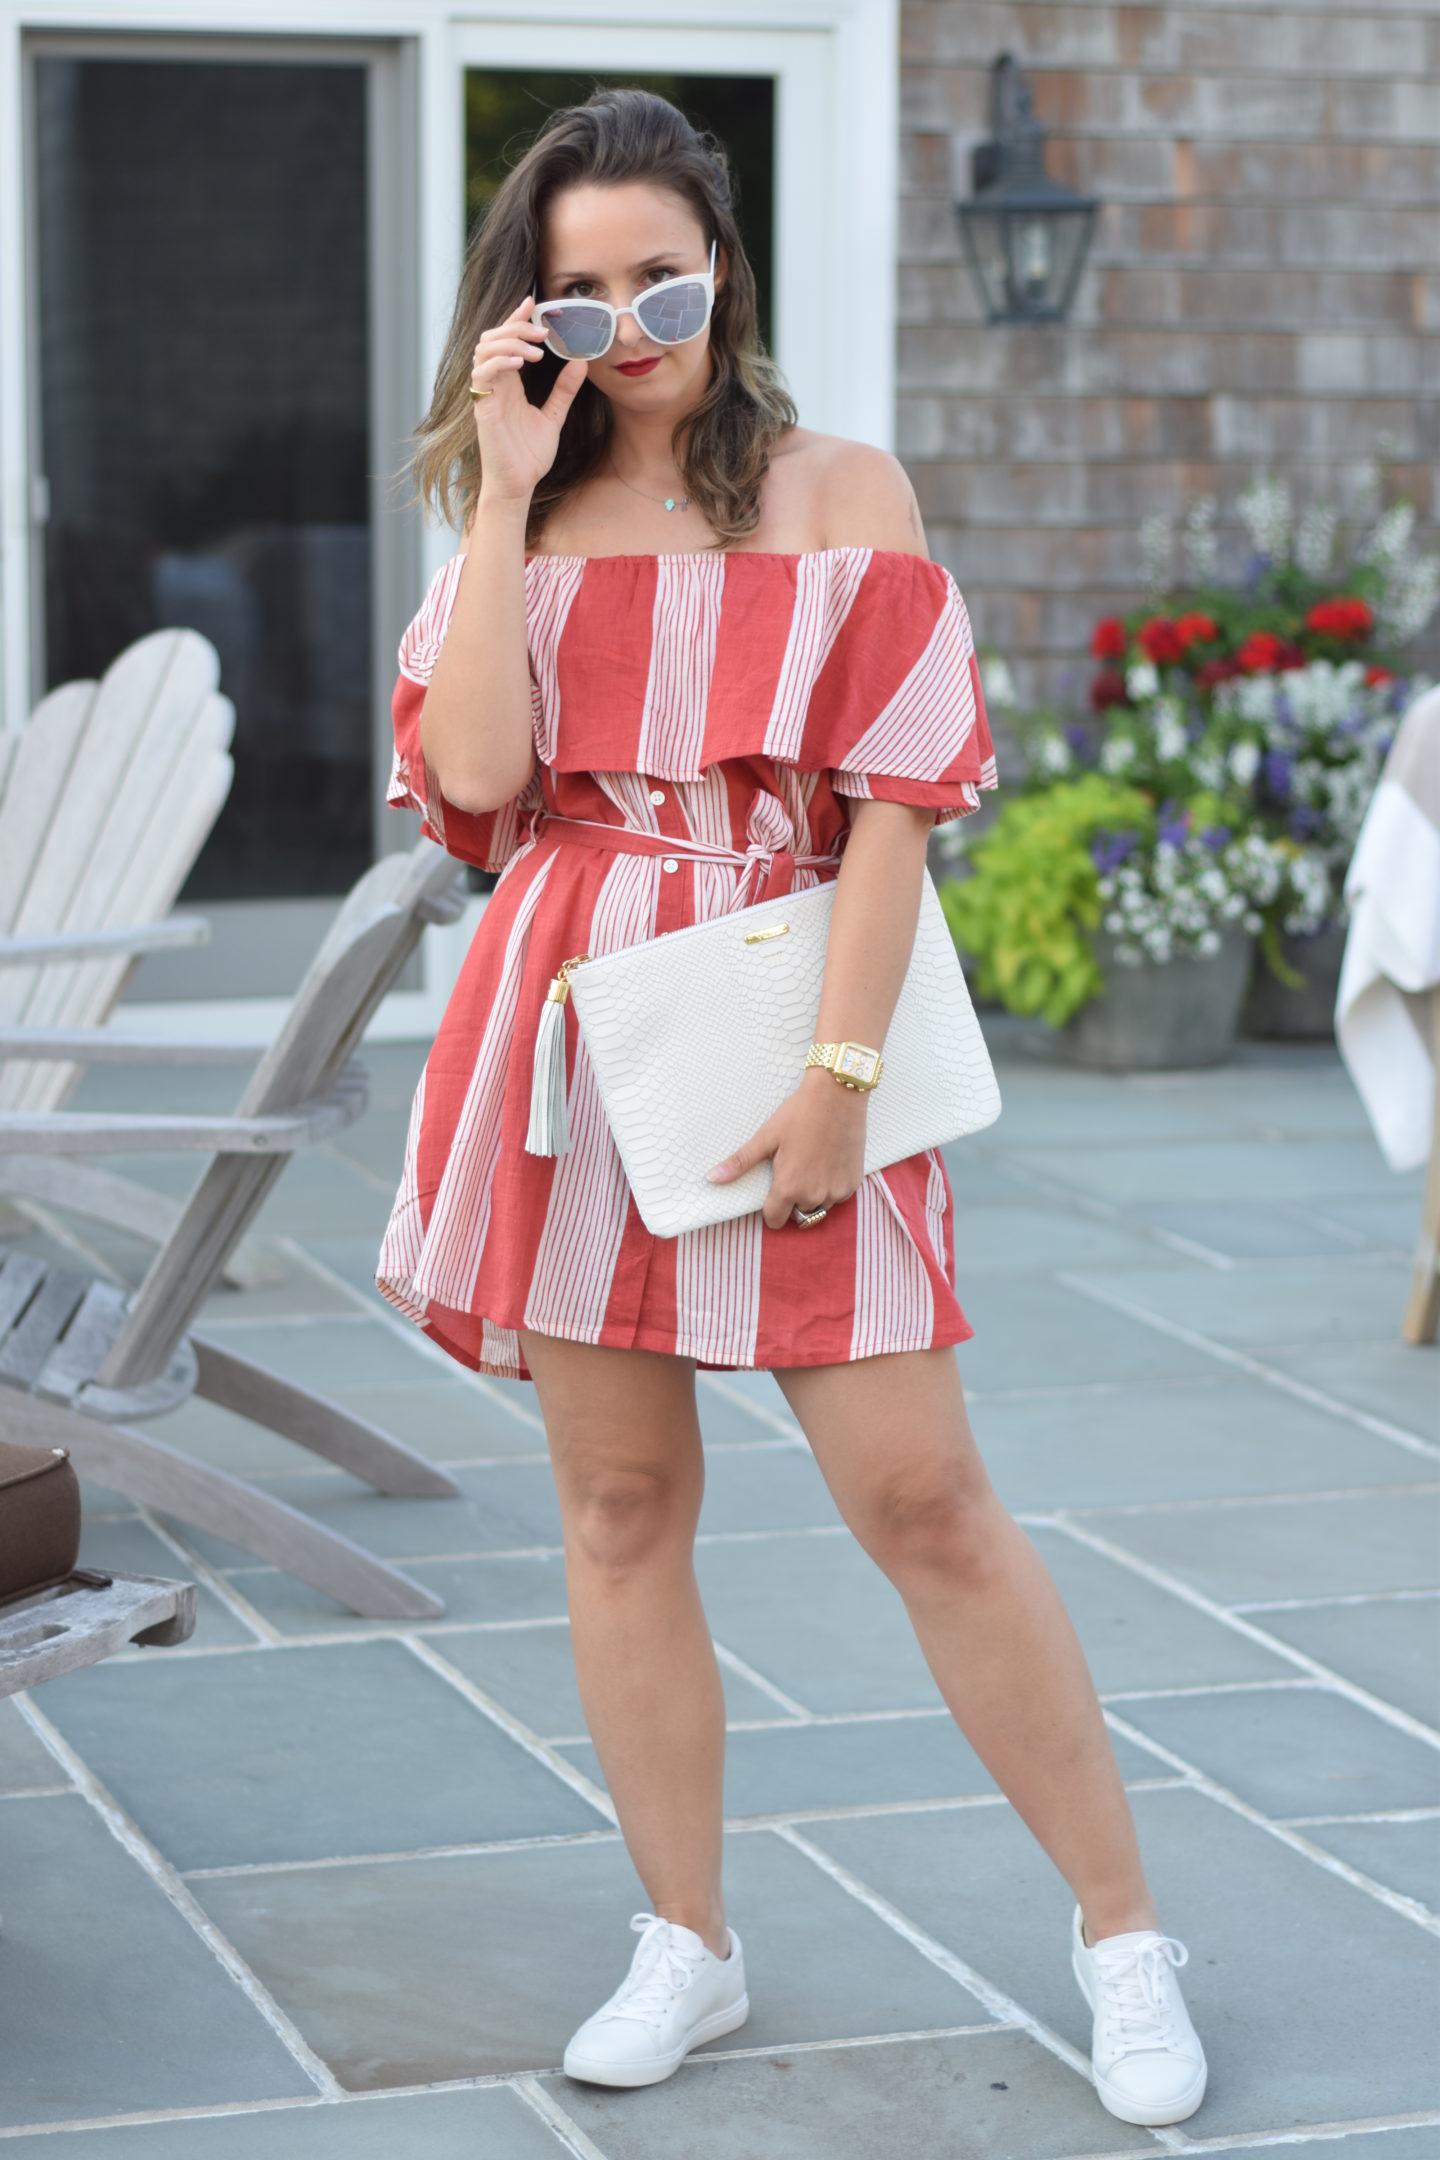 quay-white sunglasses-style-blogger